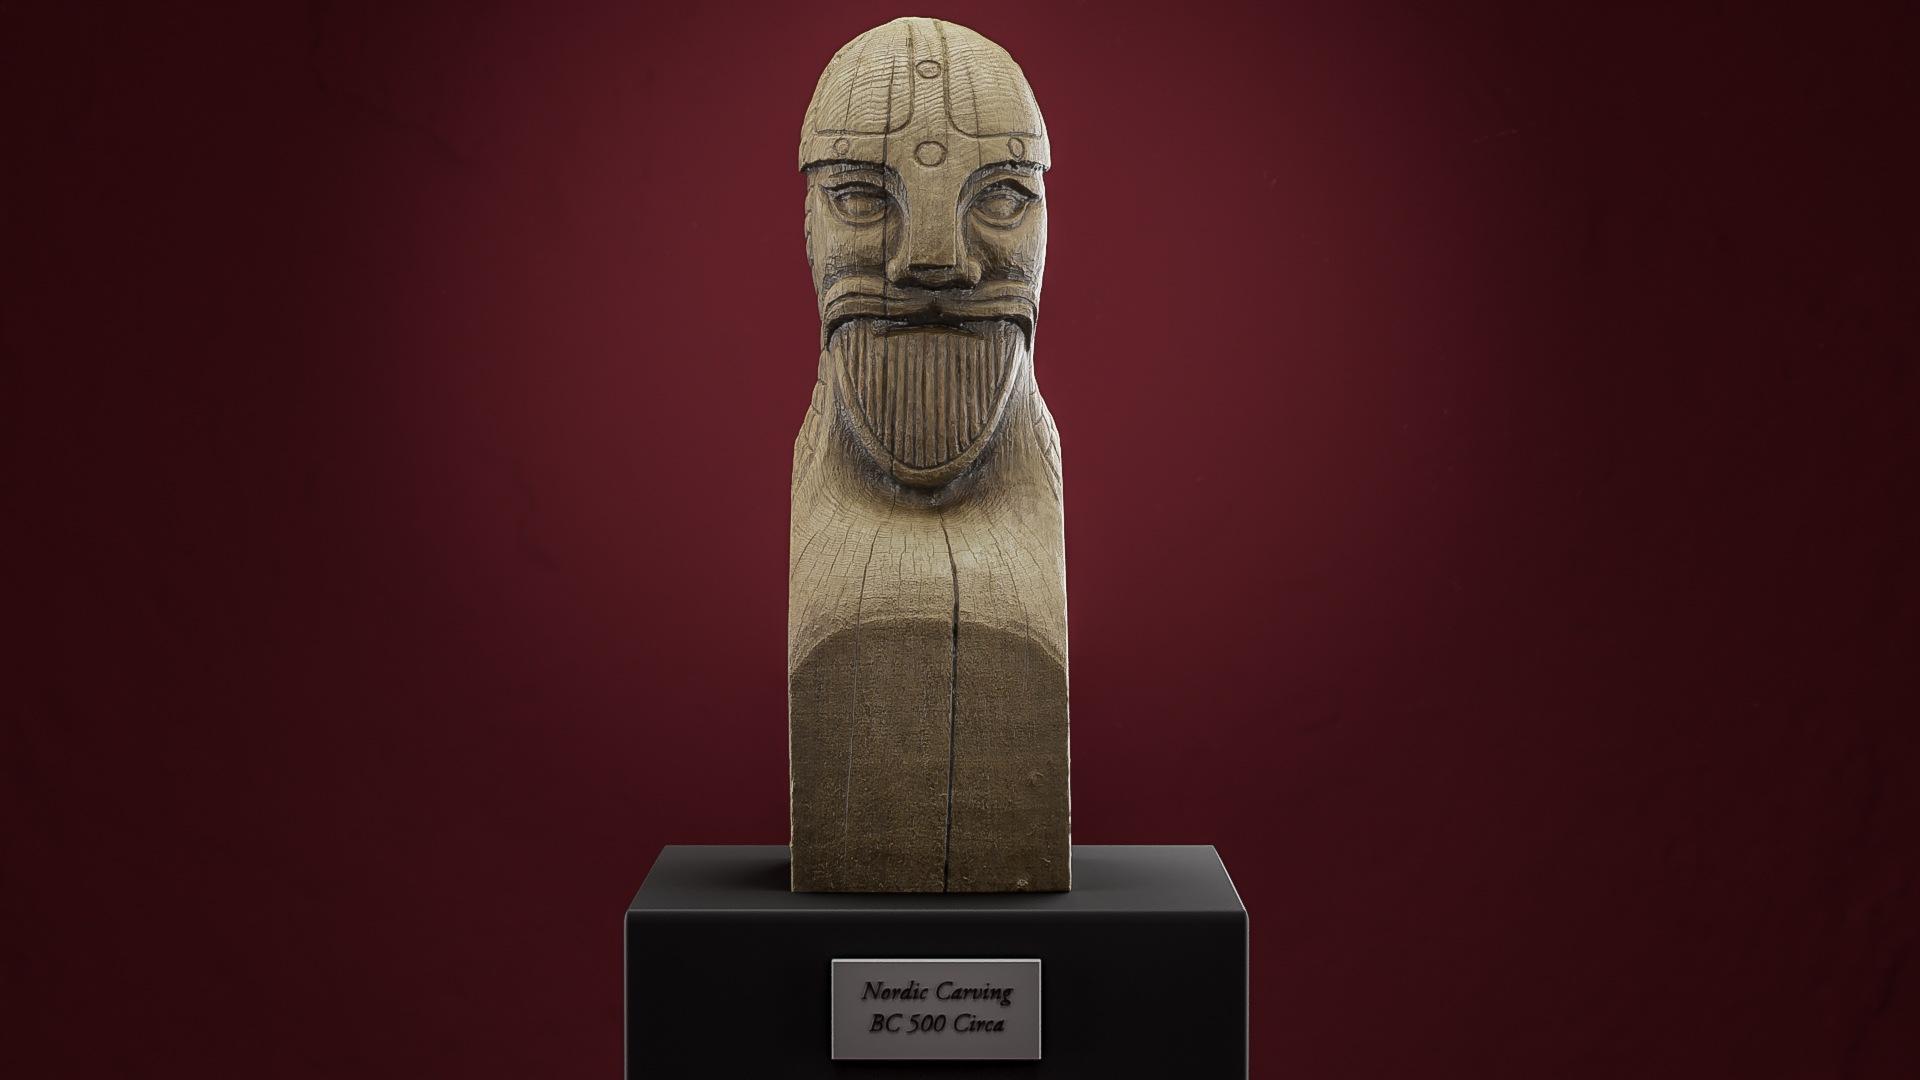 Viking Carving